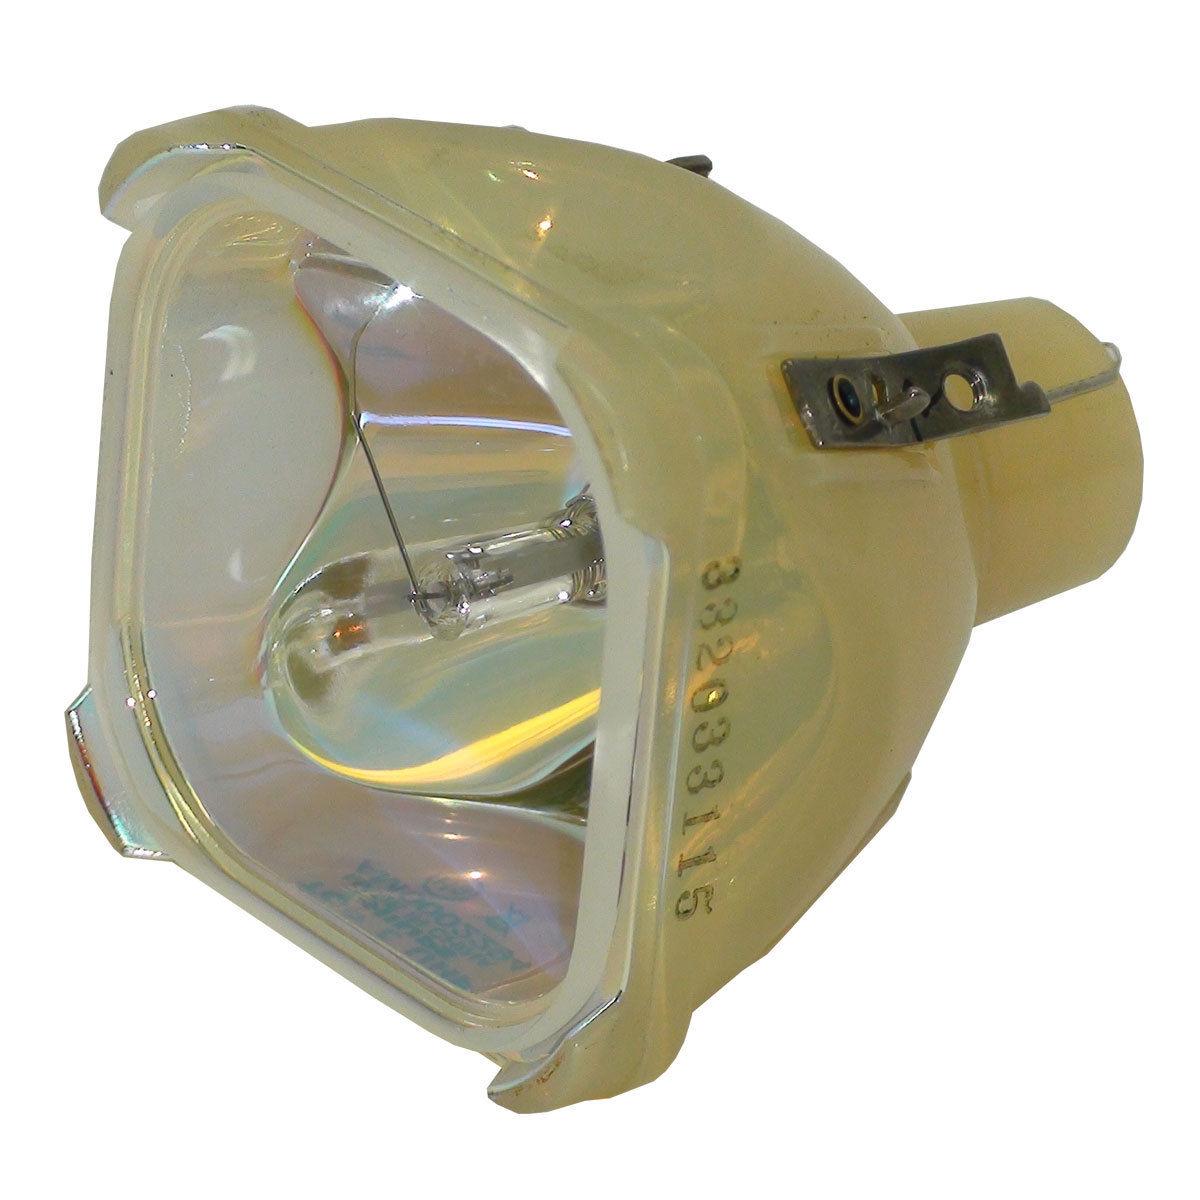 Compatible Bare Bulb POA-LMP54 LMP54 610-302-5933 for SANYO PLV-Z1 PLV-Z1BL PLV-Z1C Projector Lamp Bulbs without housing lamp housing for sanyo 610 3252957 6103252957 projector dlp lcd bulb